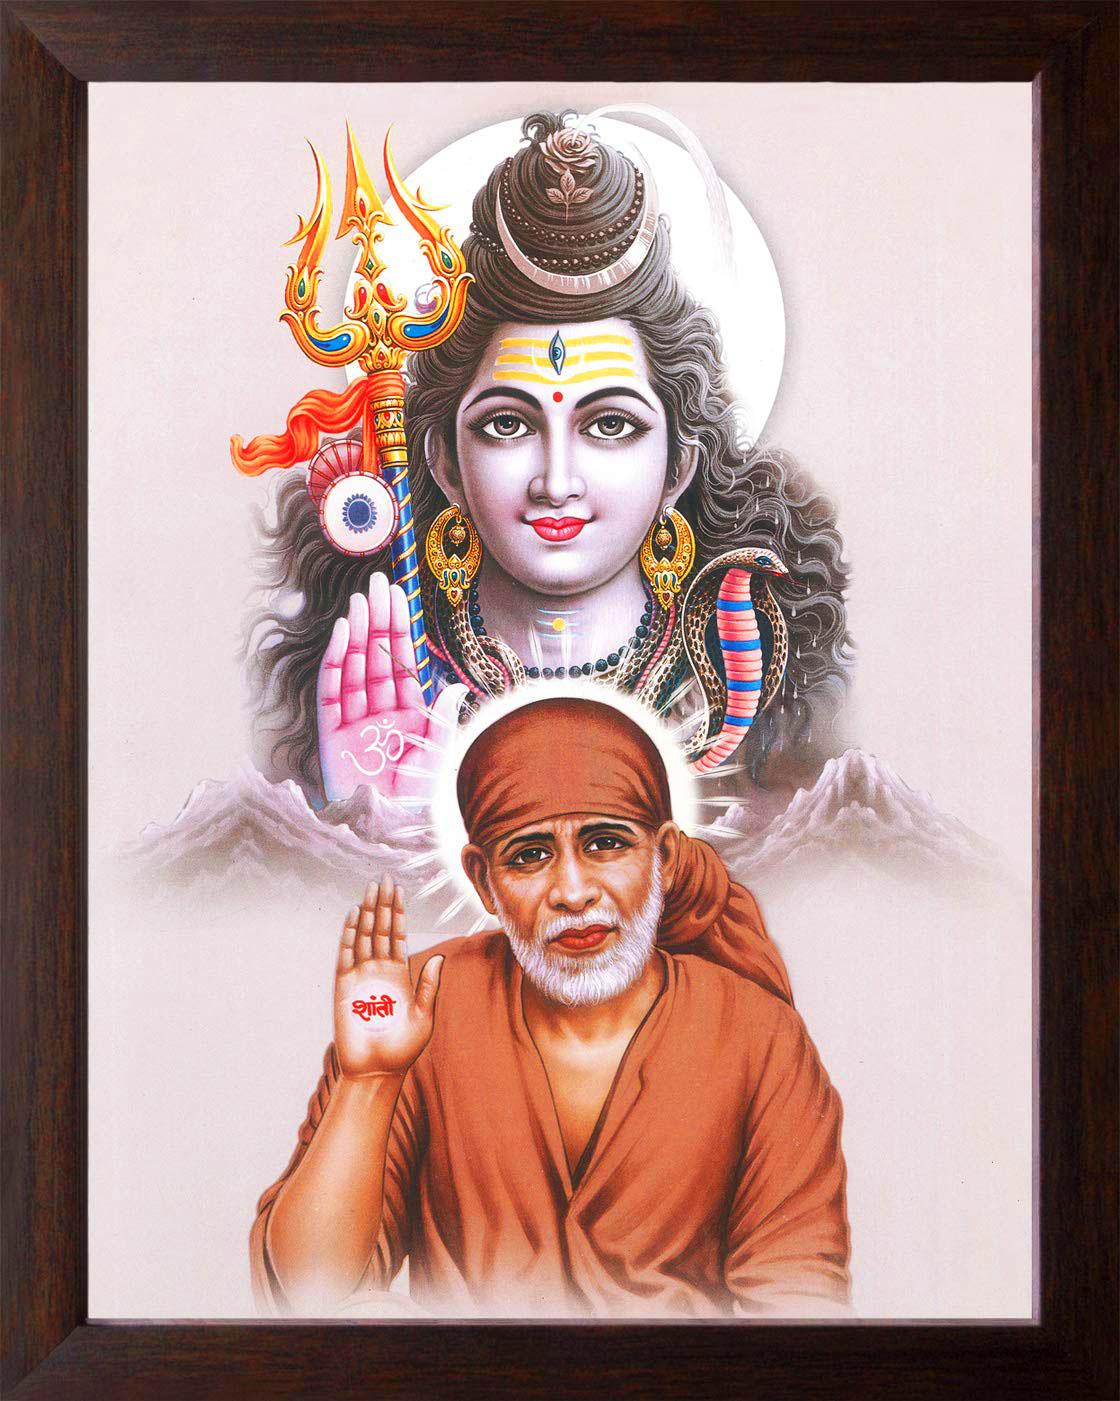 Sai Baba Blessing Images photo pics